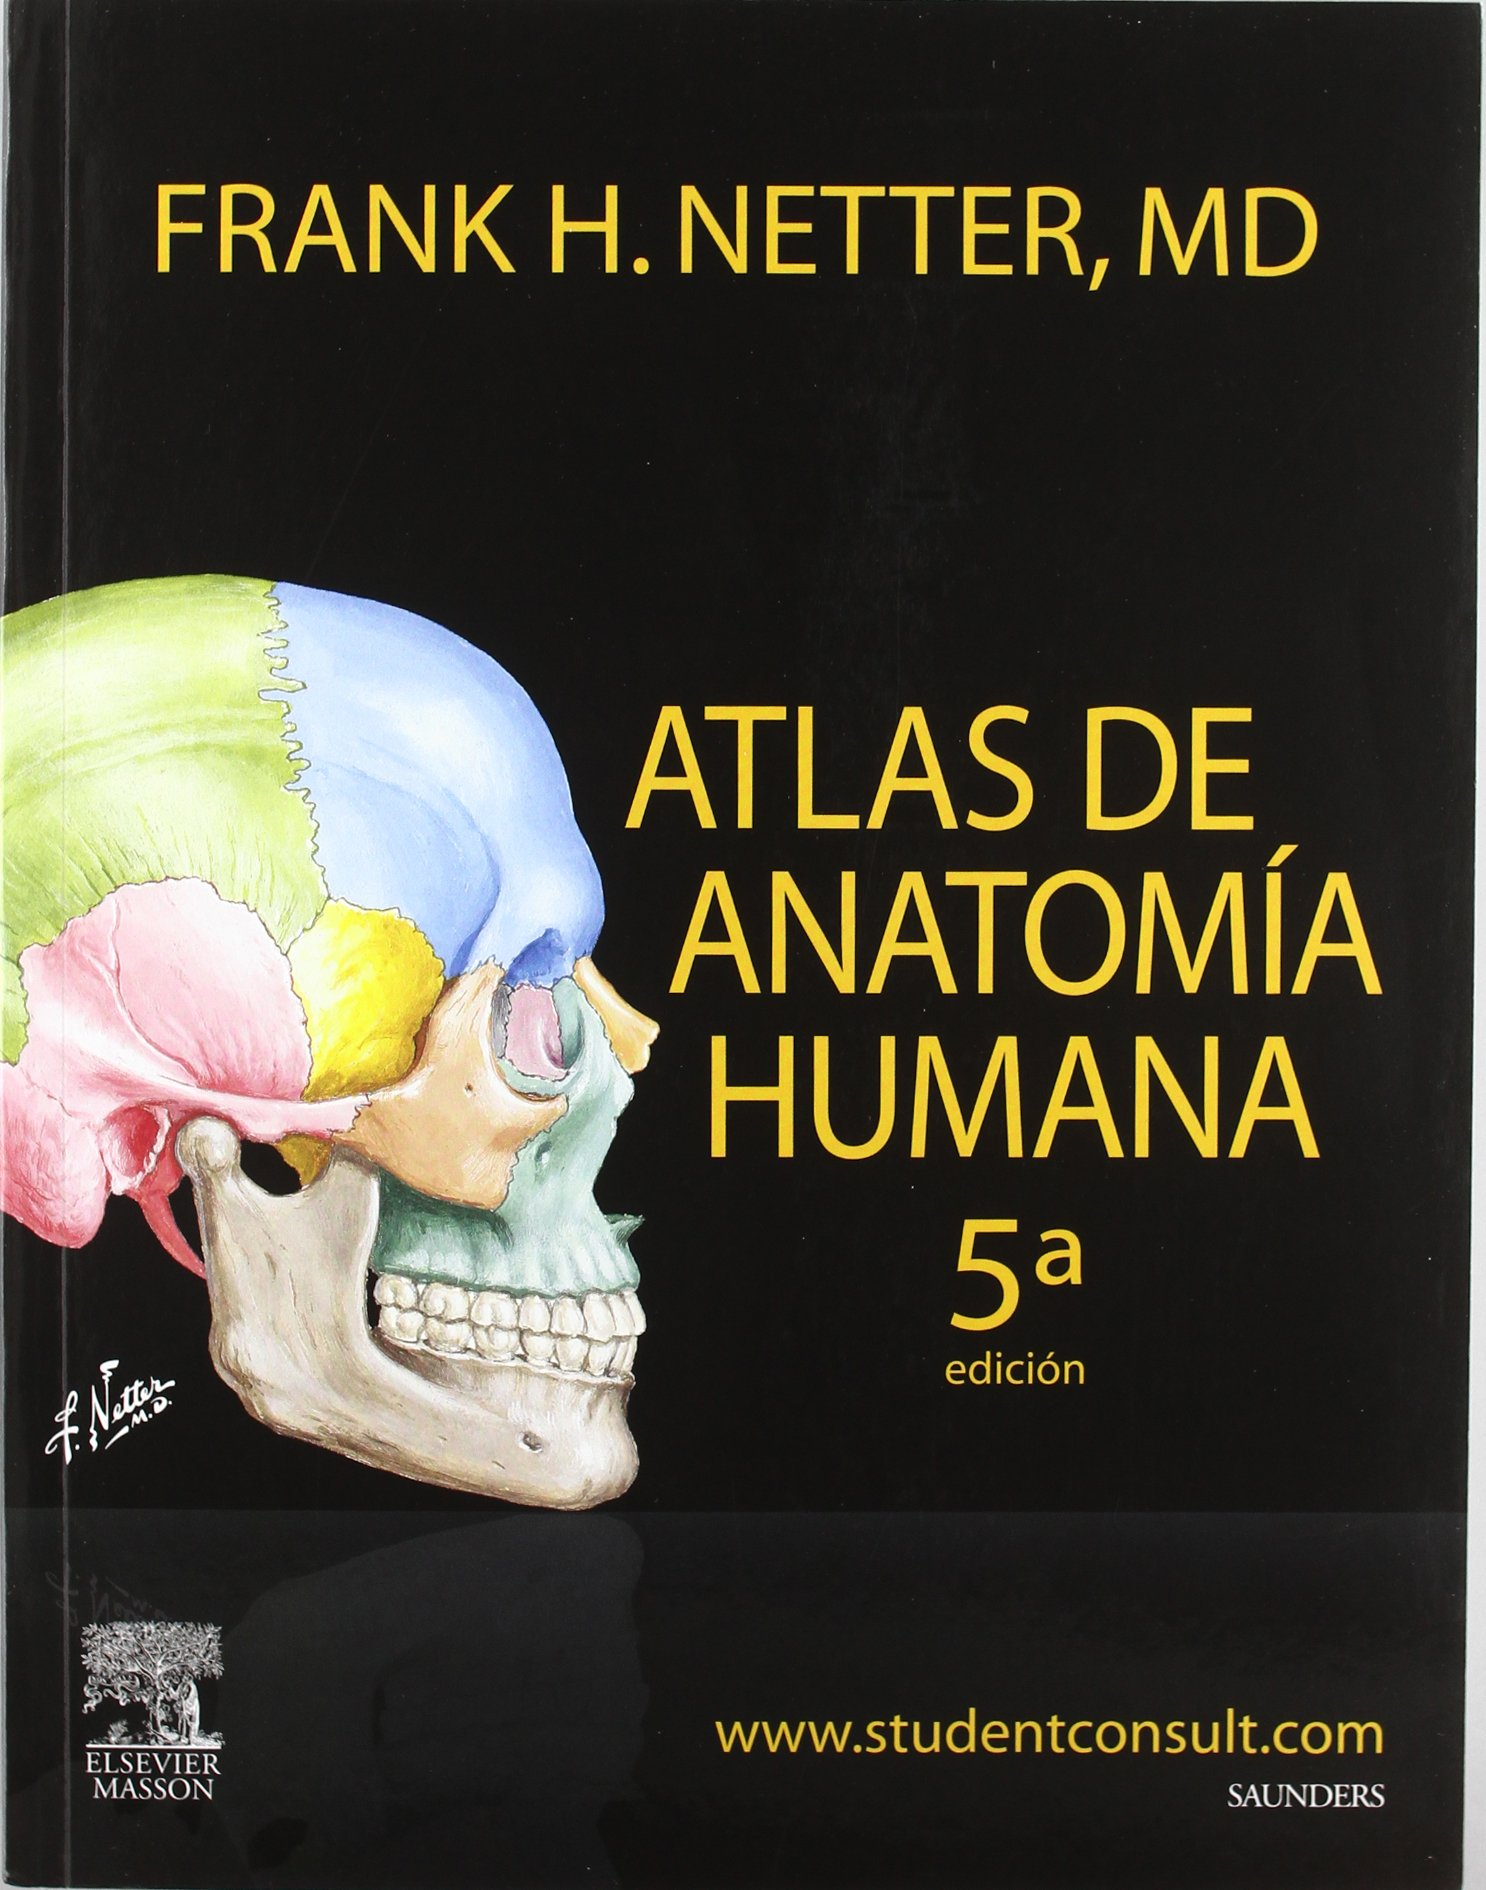 Atlas de anatomia humana: Amazon.es: Frank Henry Netter: Libros